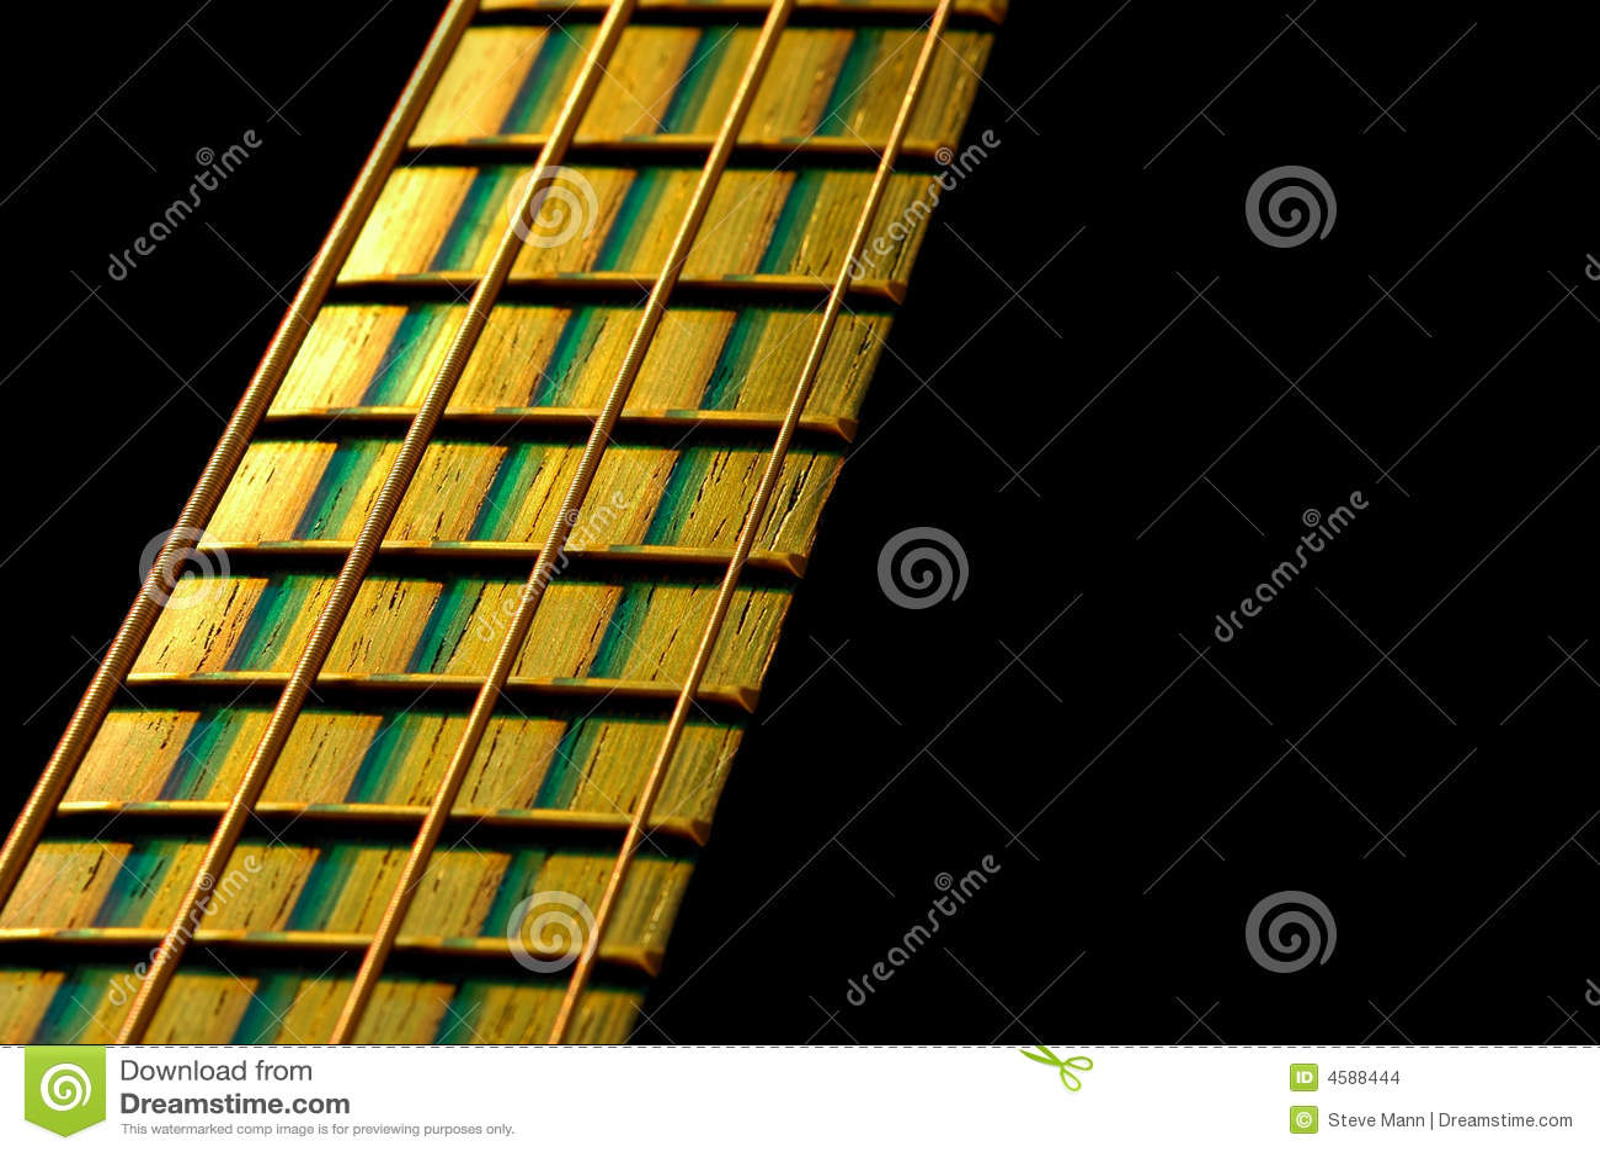 Fretboard basso